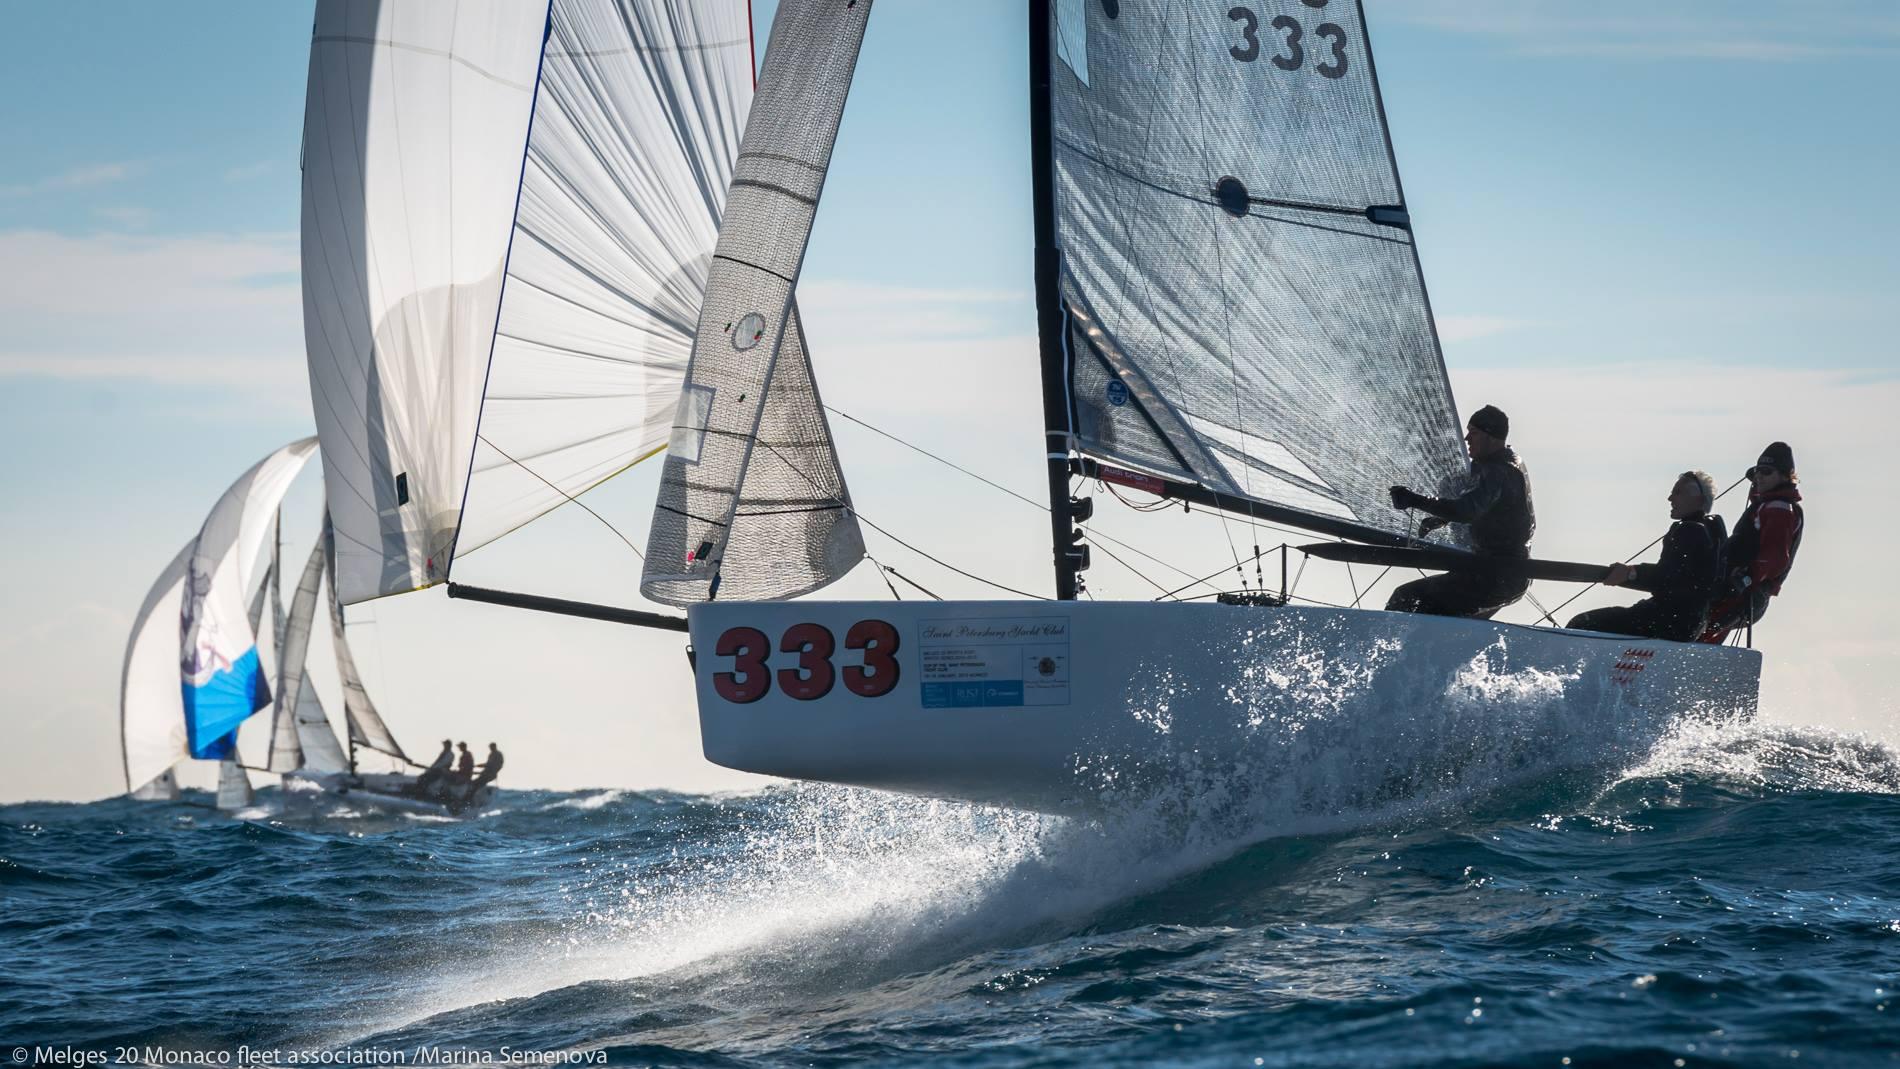 Melges 20 St Petersburg Yacht Club Cup 01